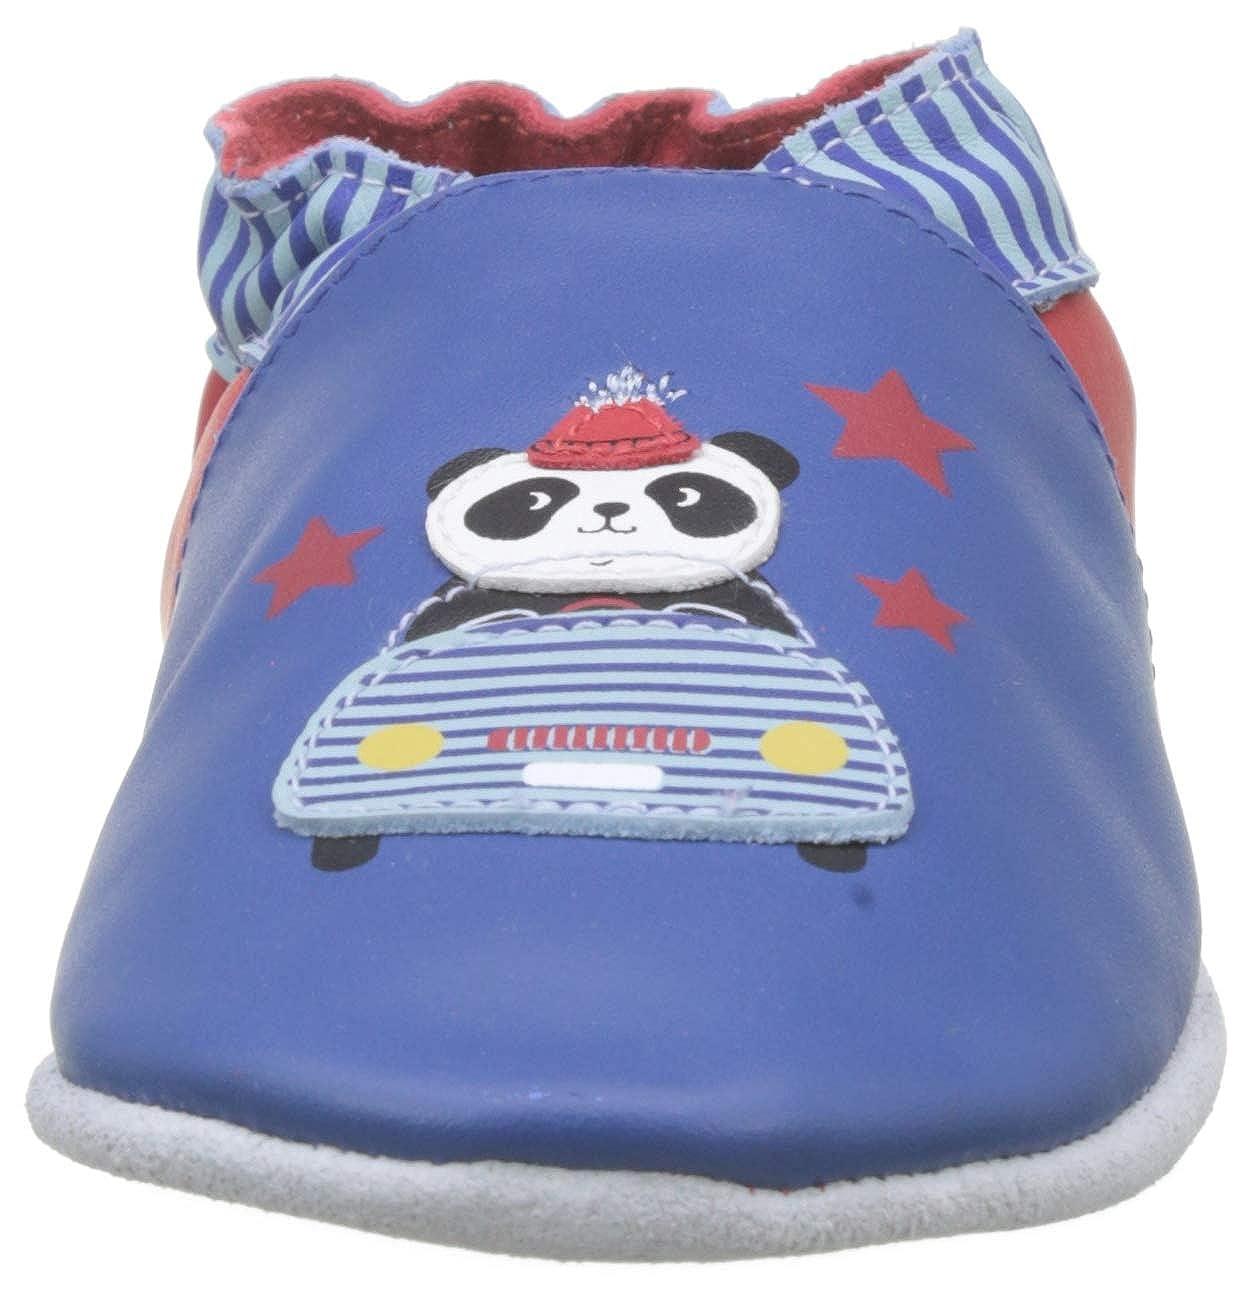 Chaussons b/éb/é gar/çon Robeez Panda Auto